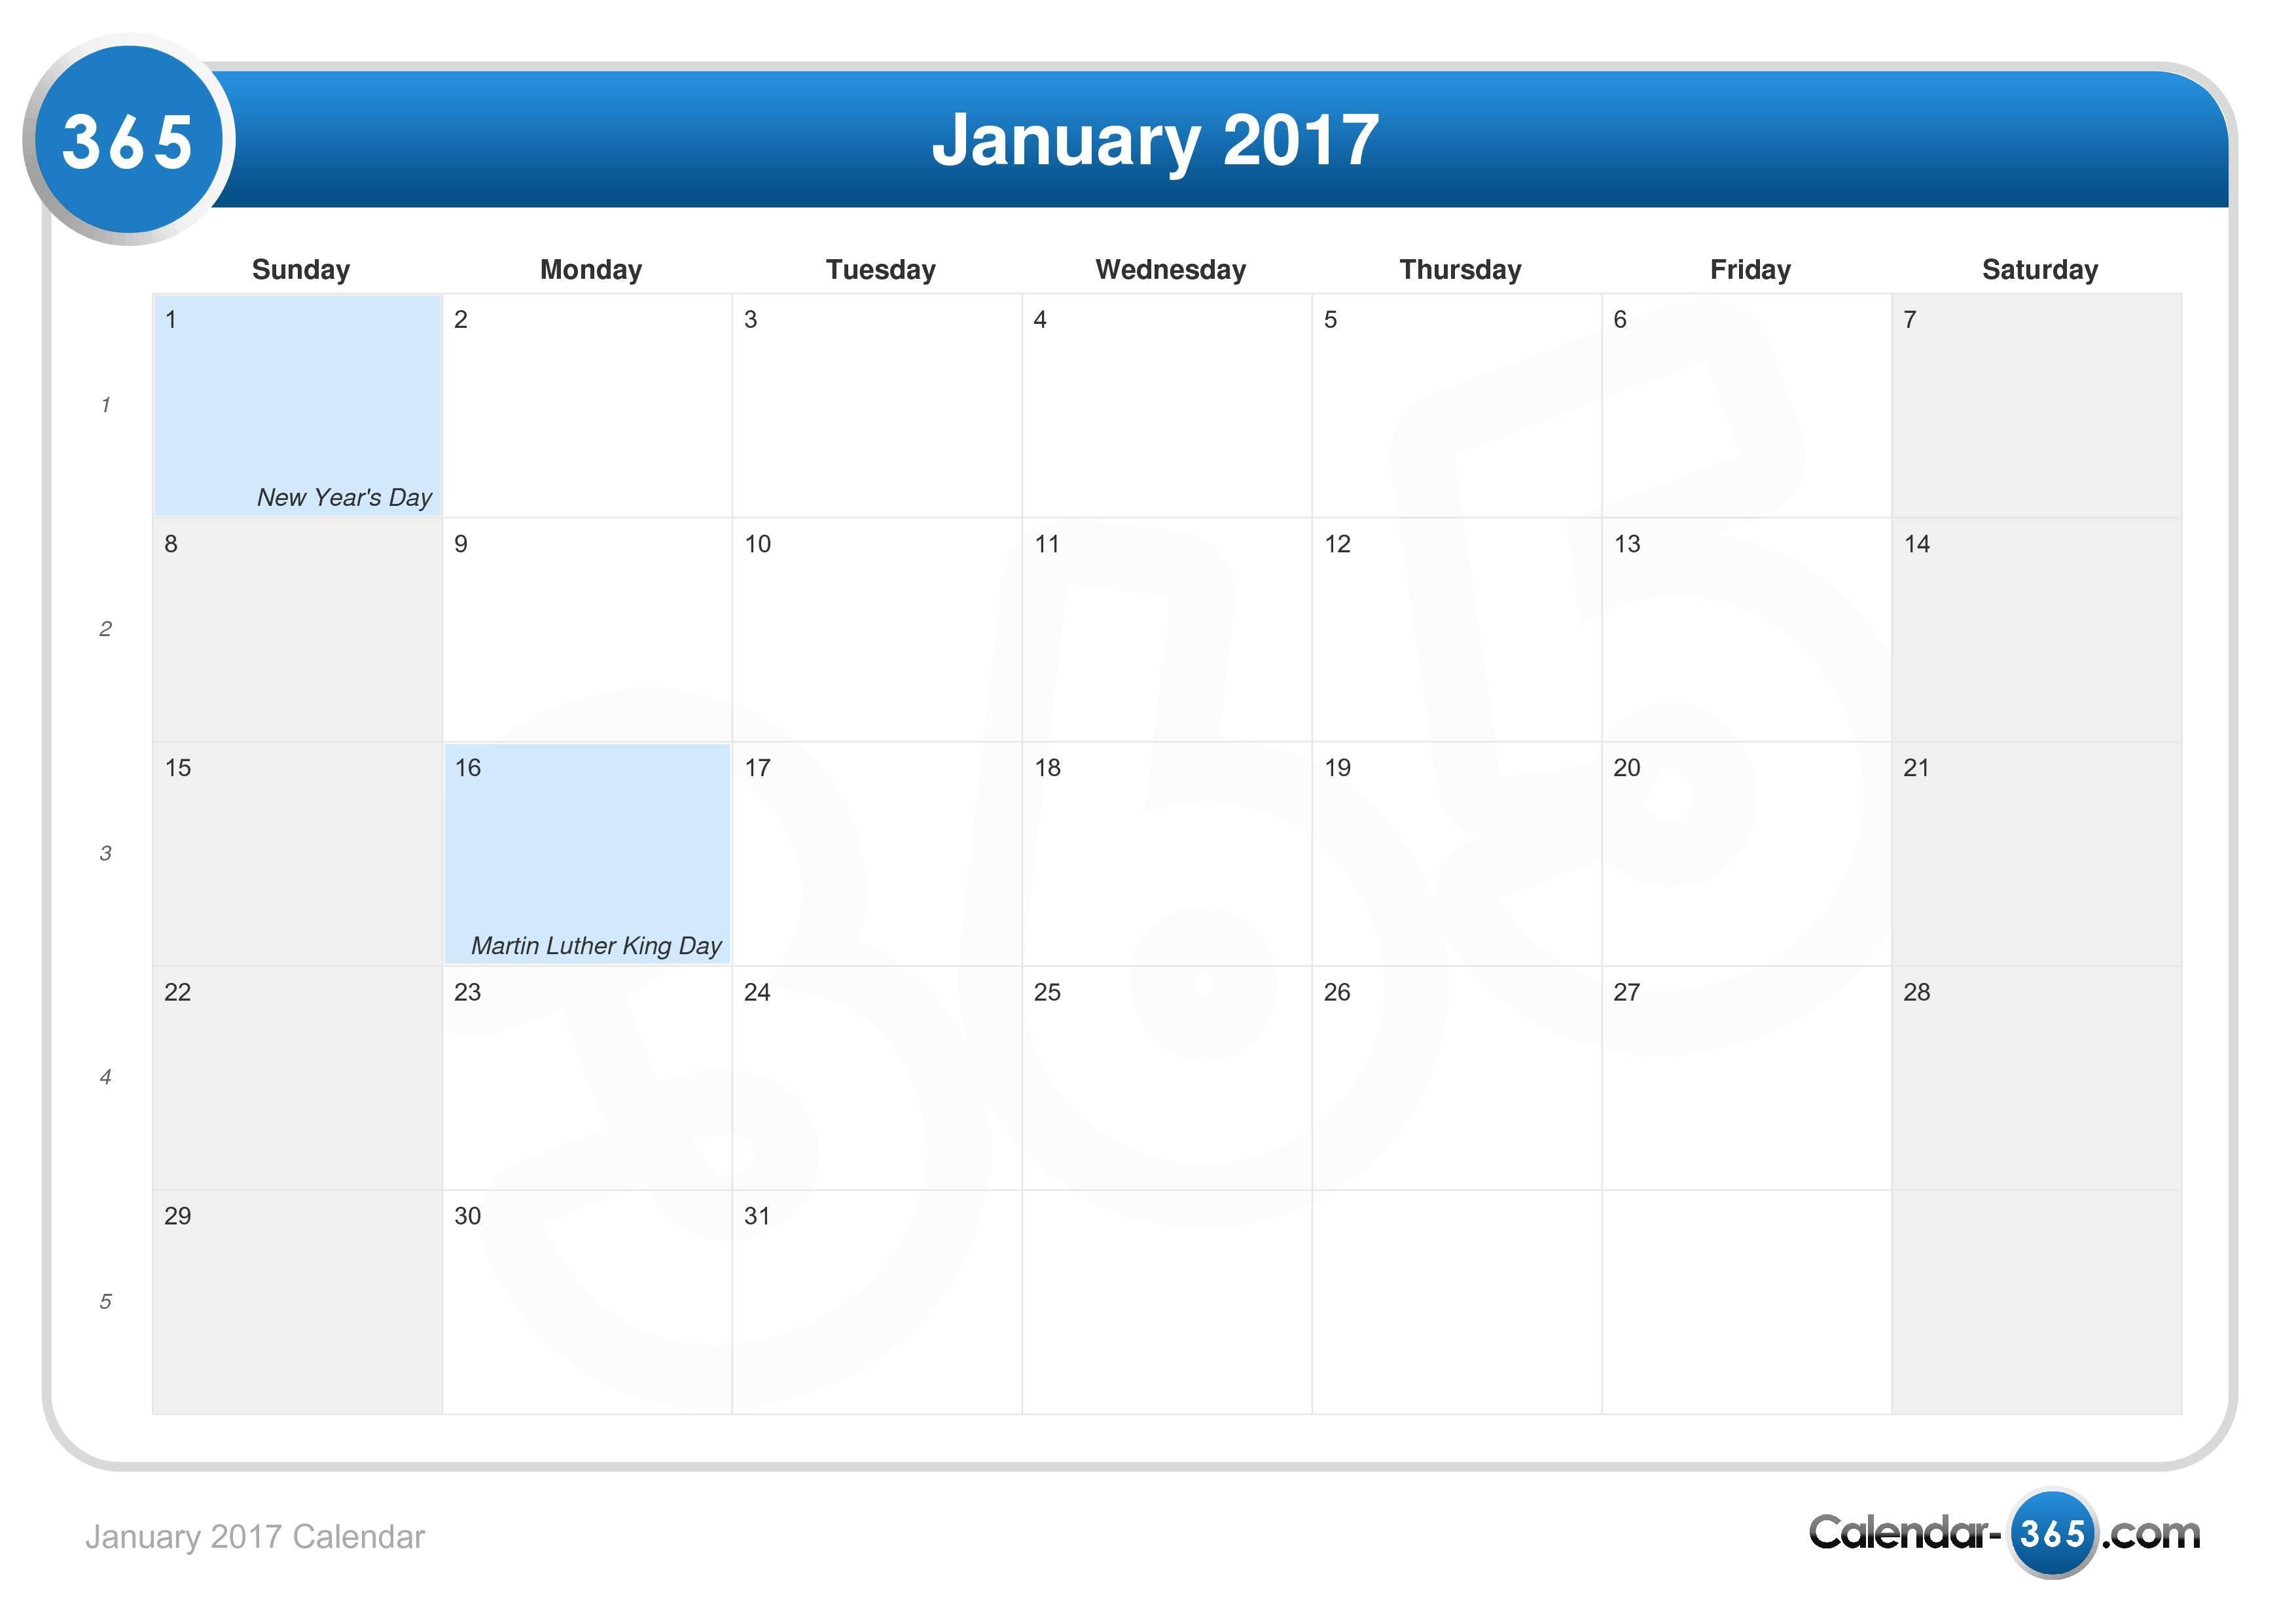 School Calendar Greensboro Nc The University Of North Carolina At Greensboro When Is Mlk Day 2016 Calendar Calendar Template 2016